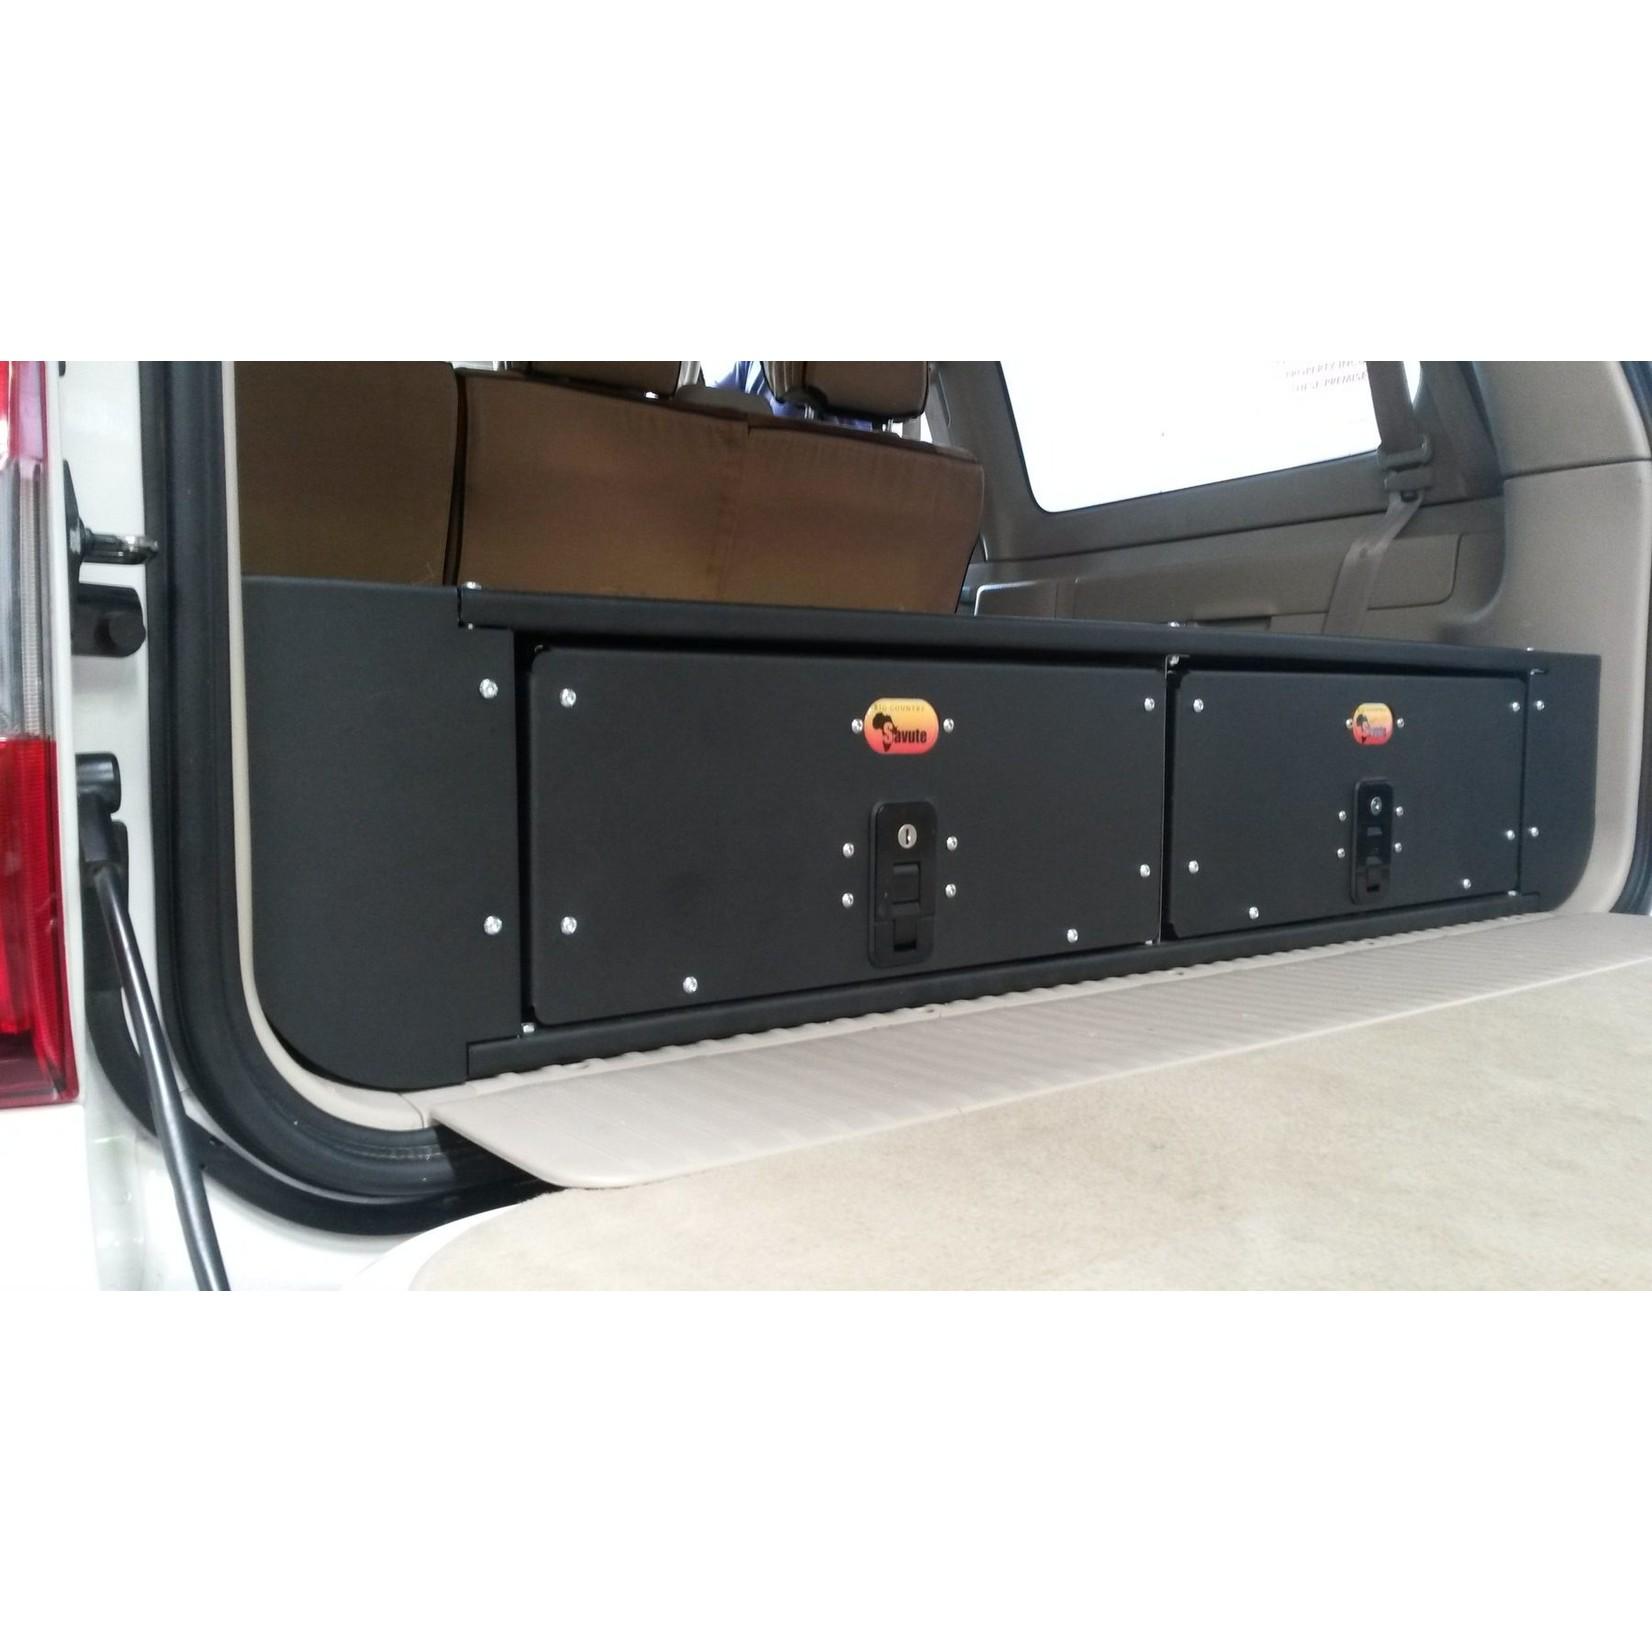 Big Country 4x4 Big Country 4x4 Toyota Land Cruiser 100/Lexus LX470 Twin Drawer Kit